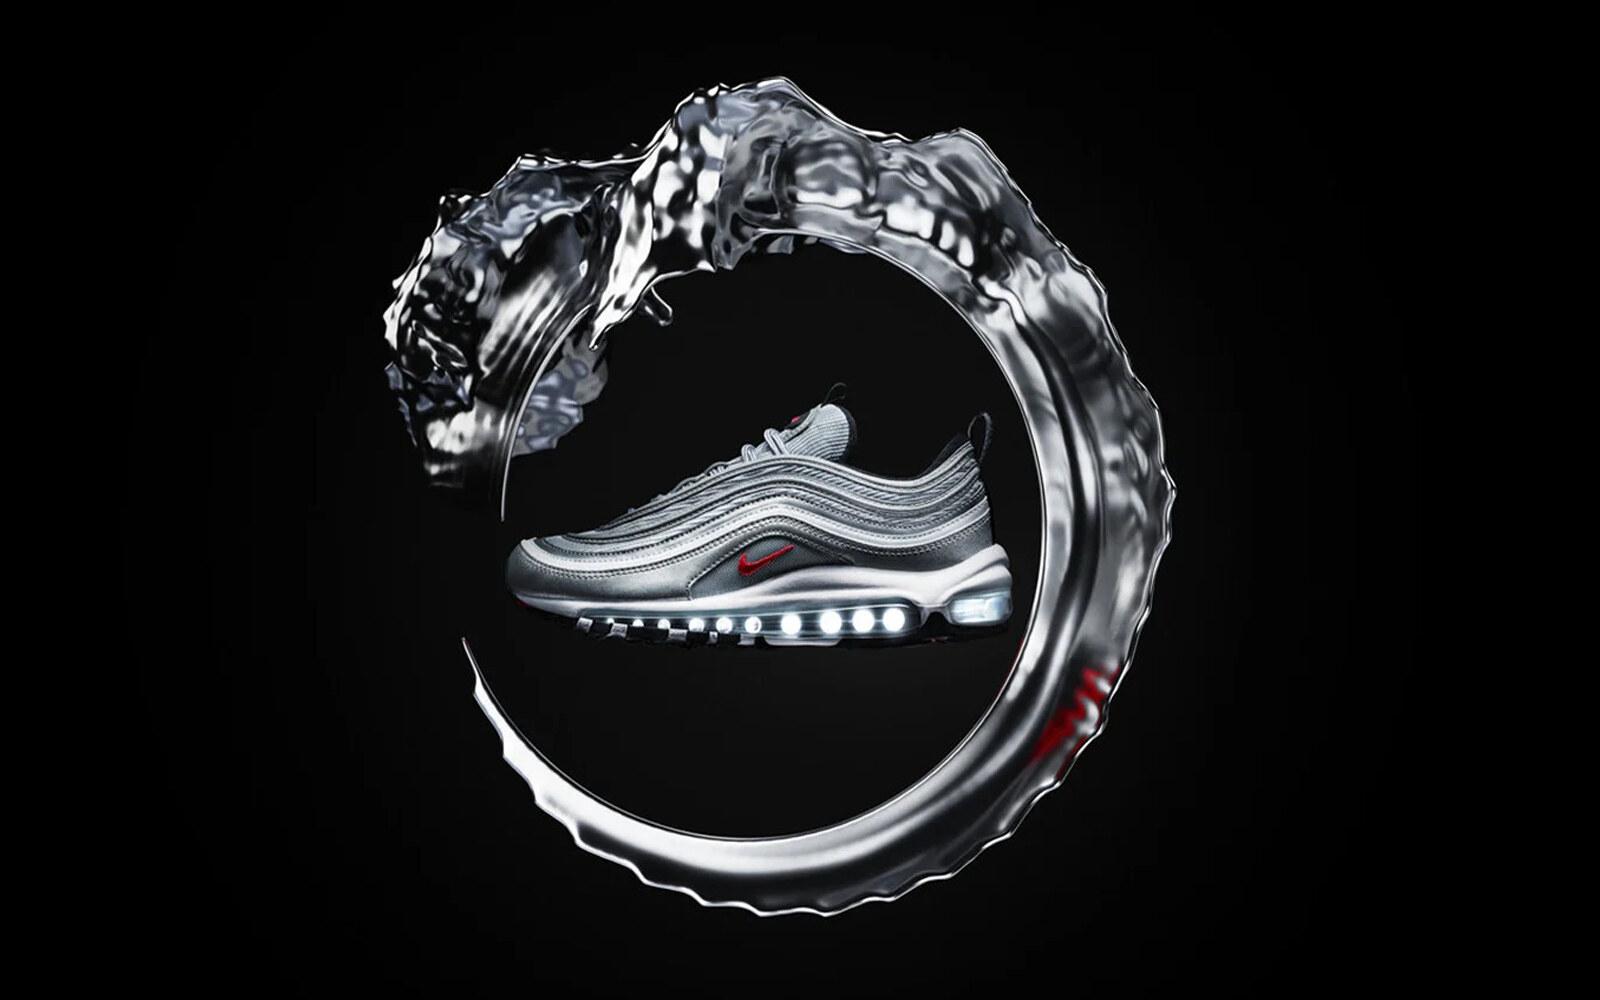 Nike Air Max 97 Silver Bullet 2022